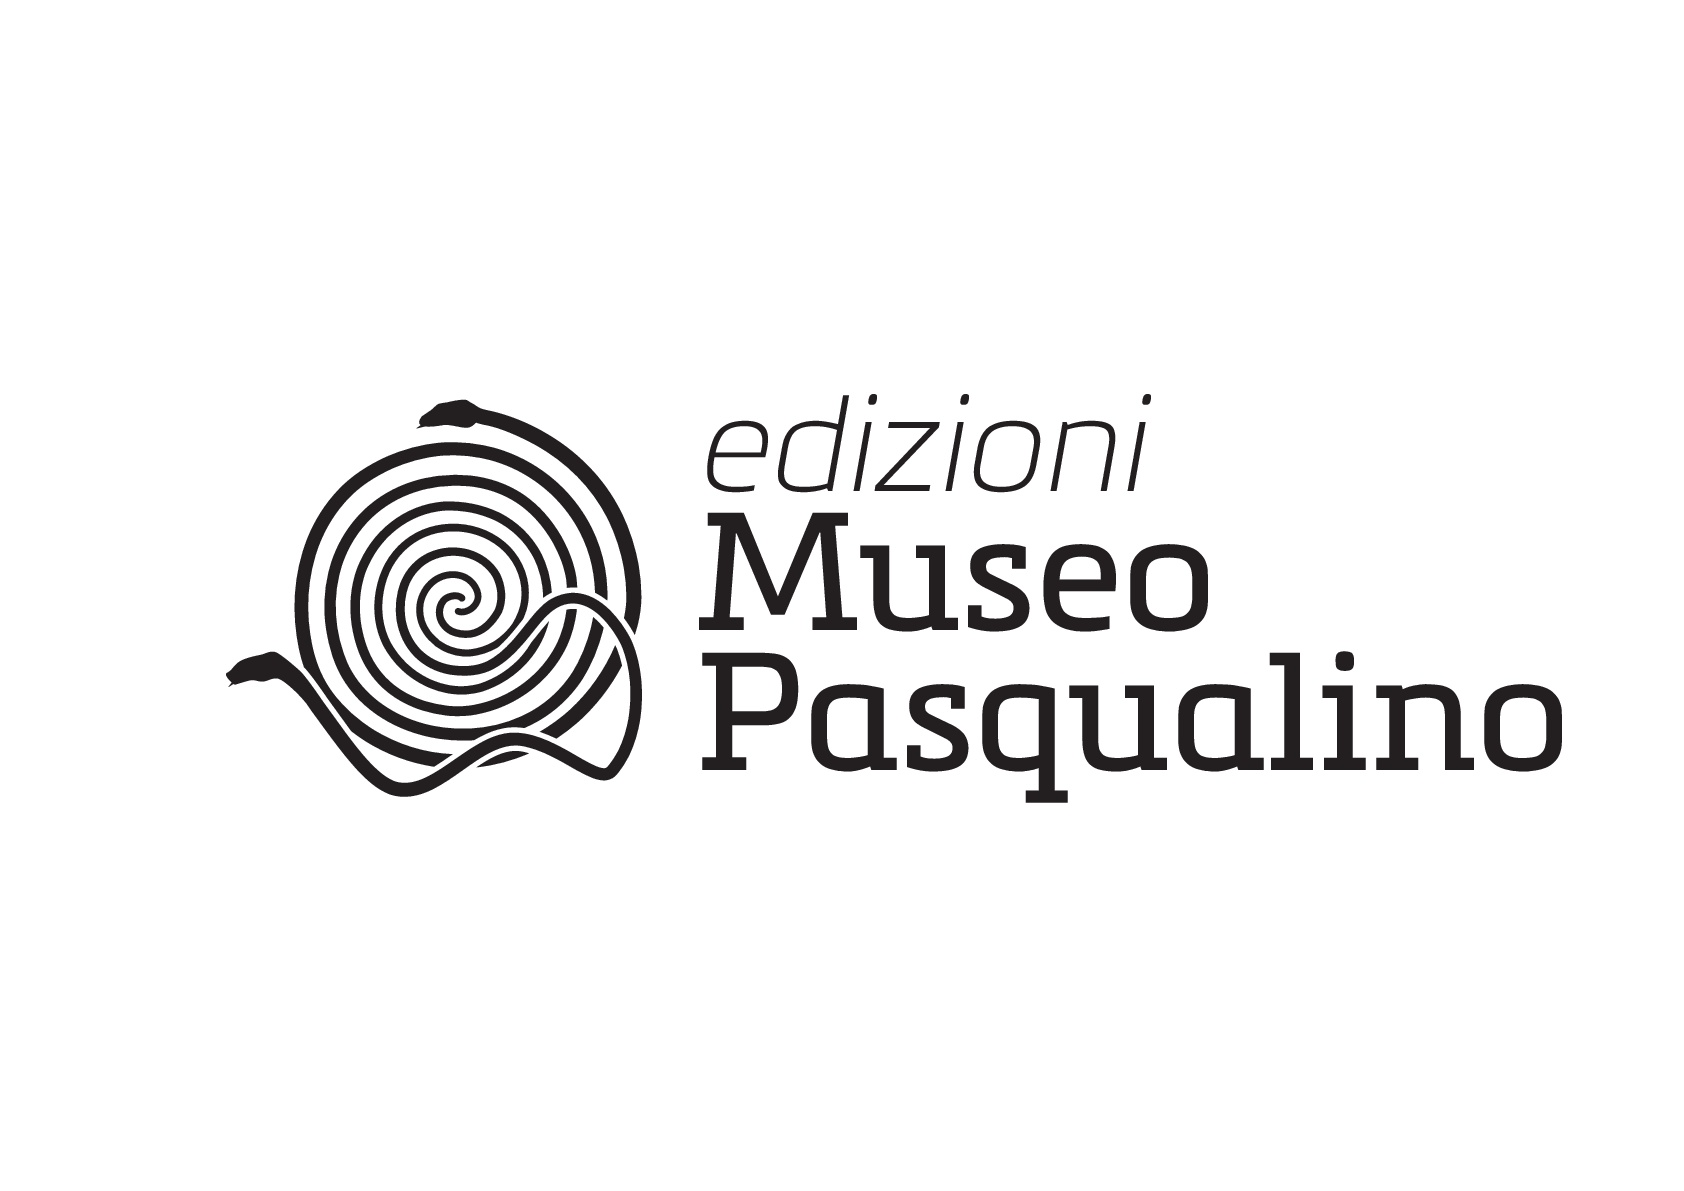 logo_edizioni_museo_pasqualino-001.jpg - 147.17 kB